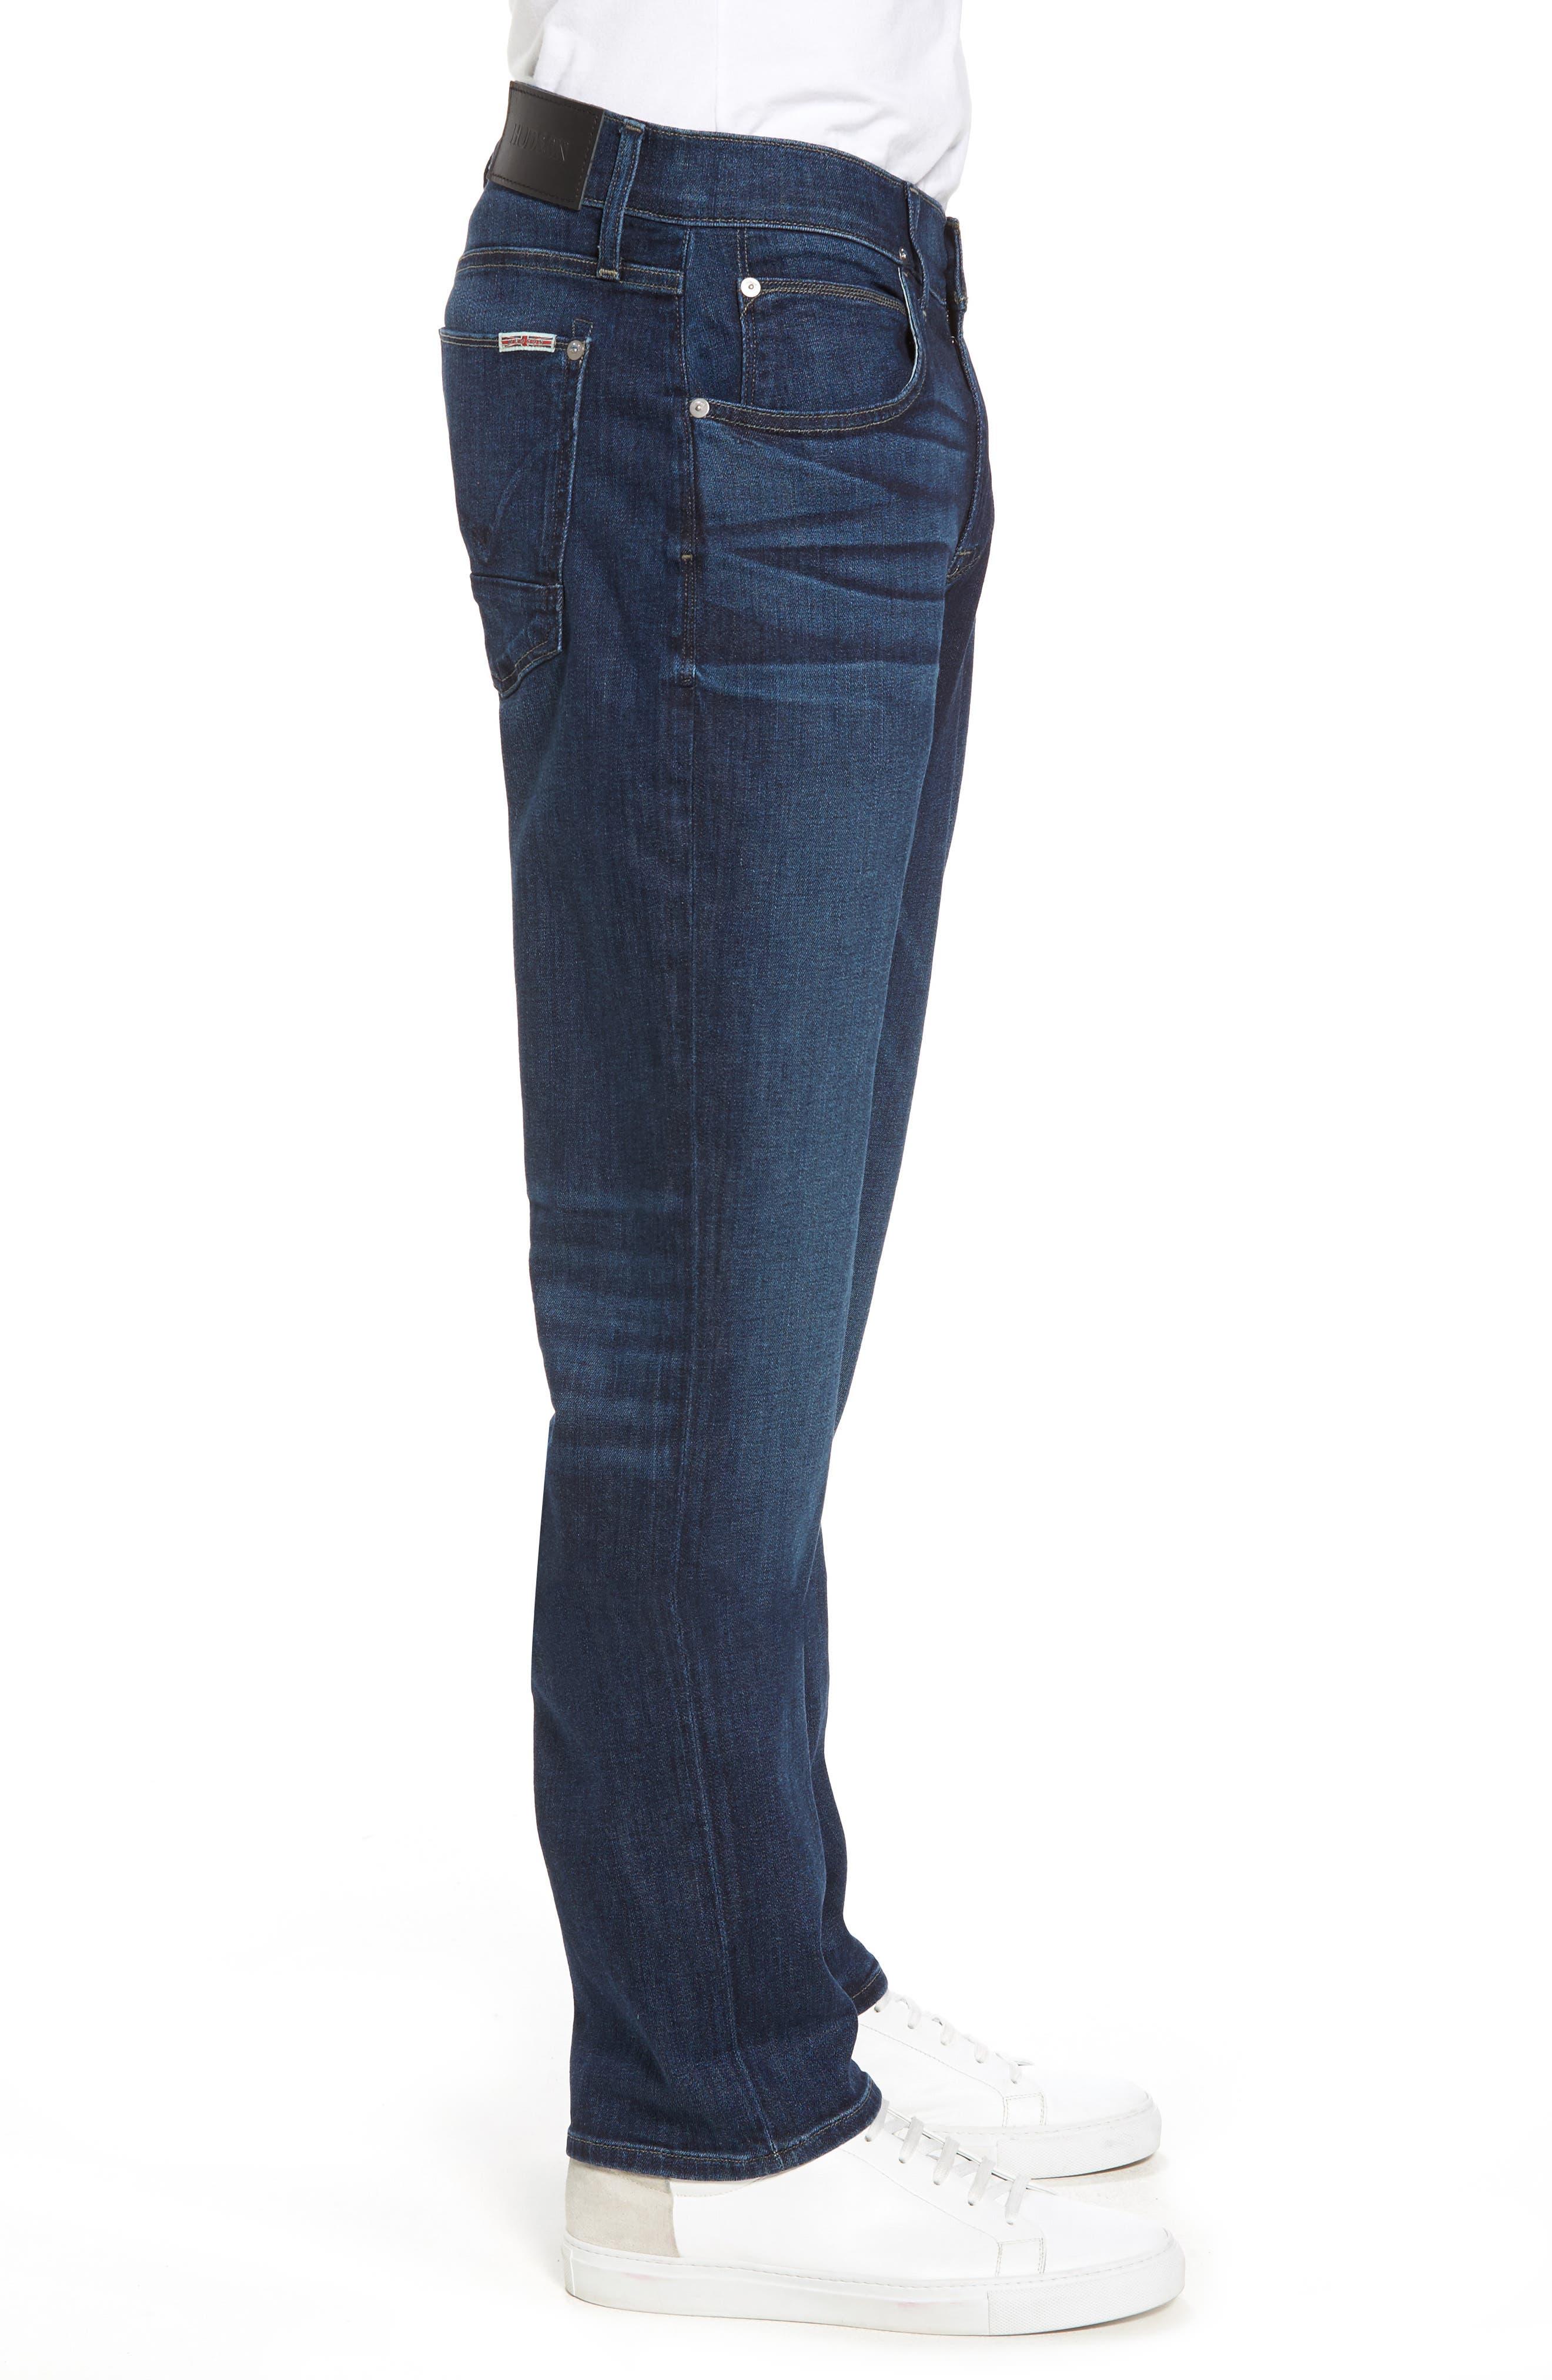 Alternate Image 3  - Hudson Jeans Byron Slim Straight Fit Jeans (Draper)